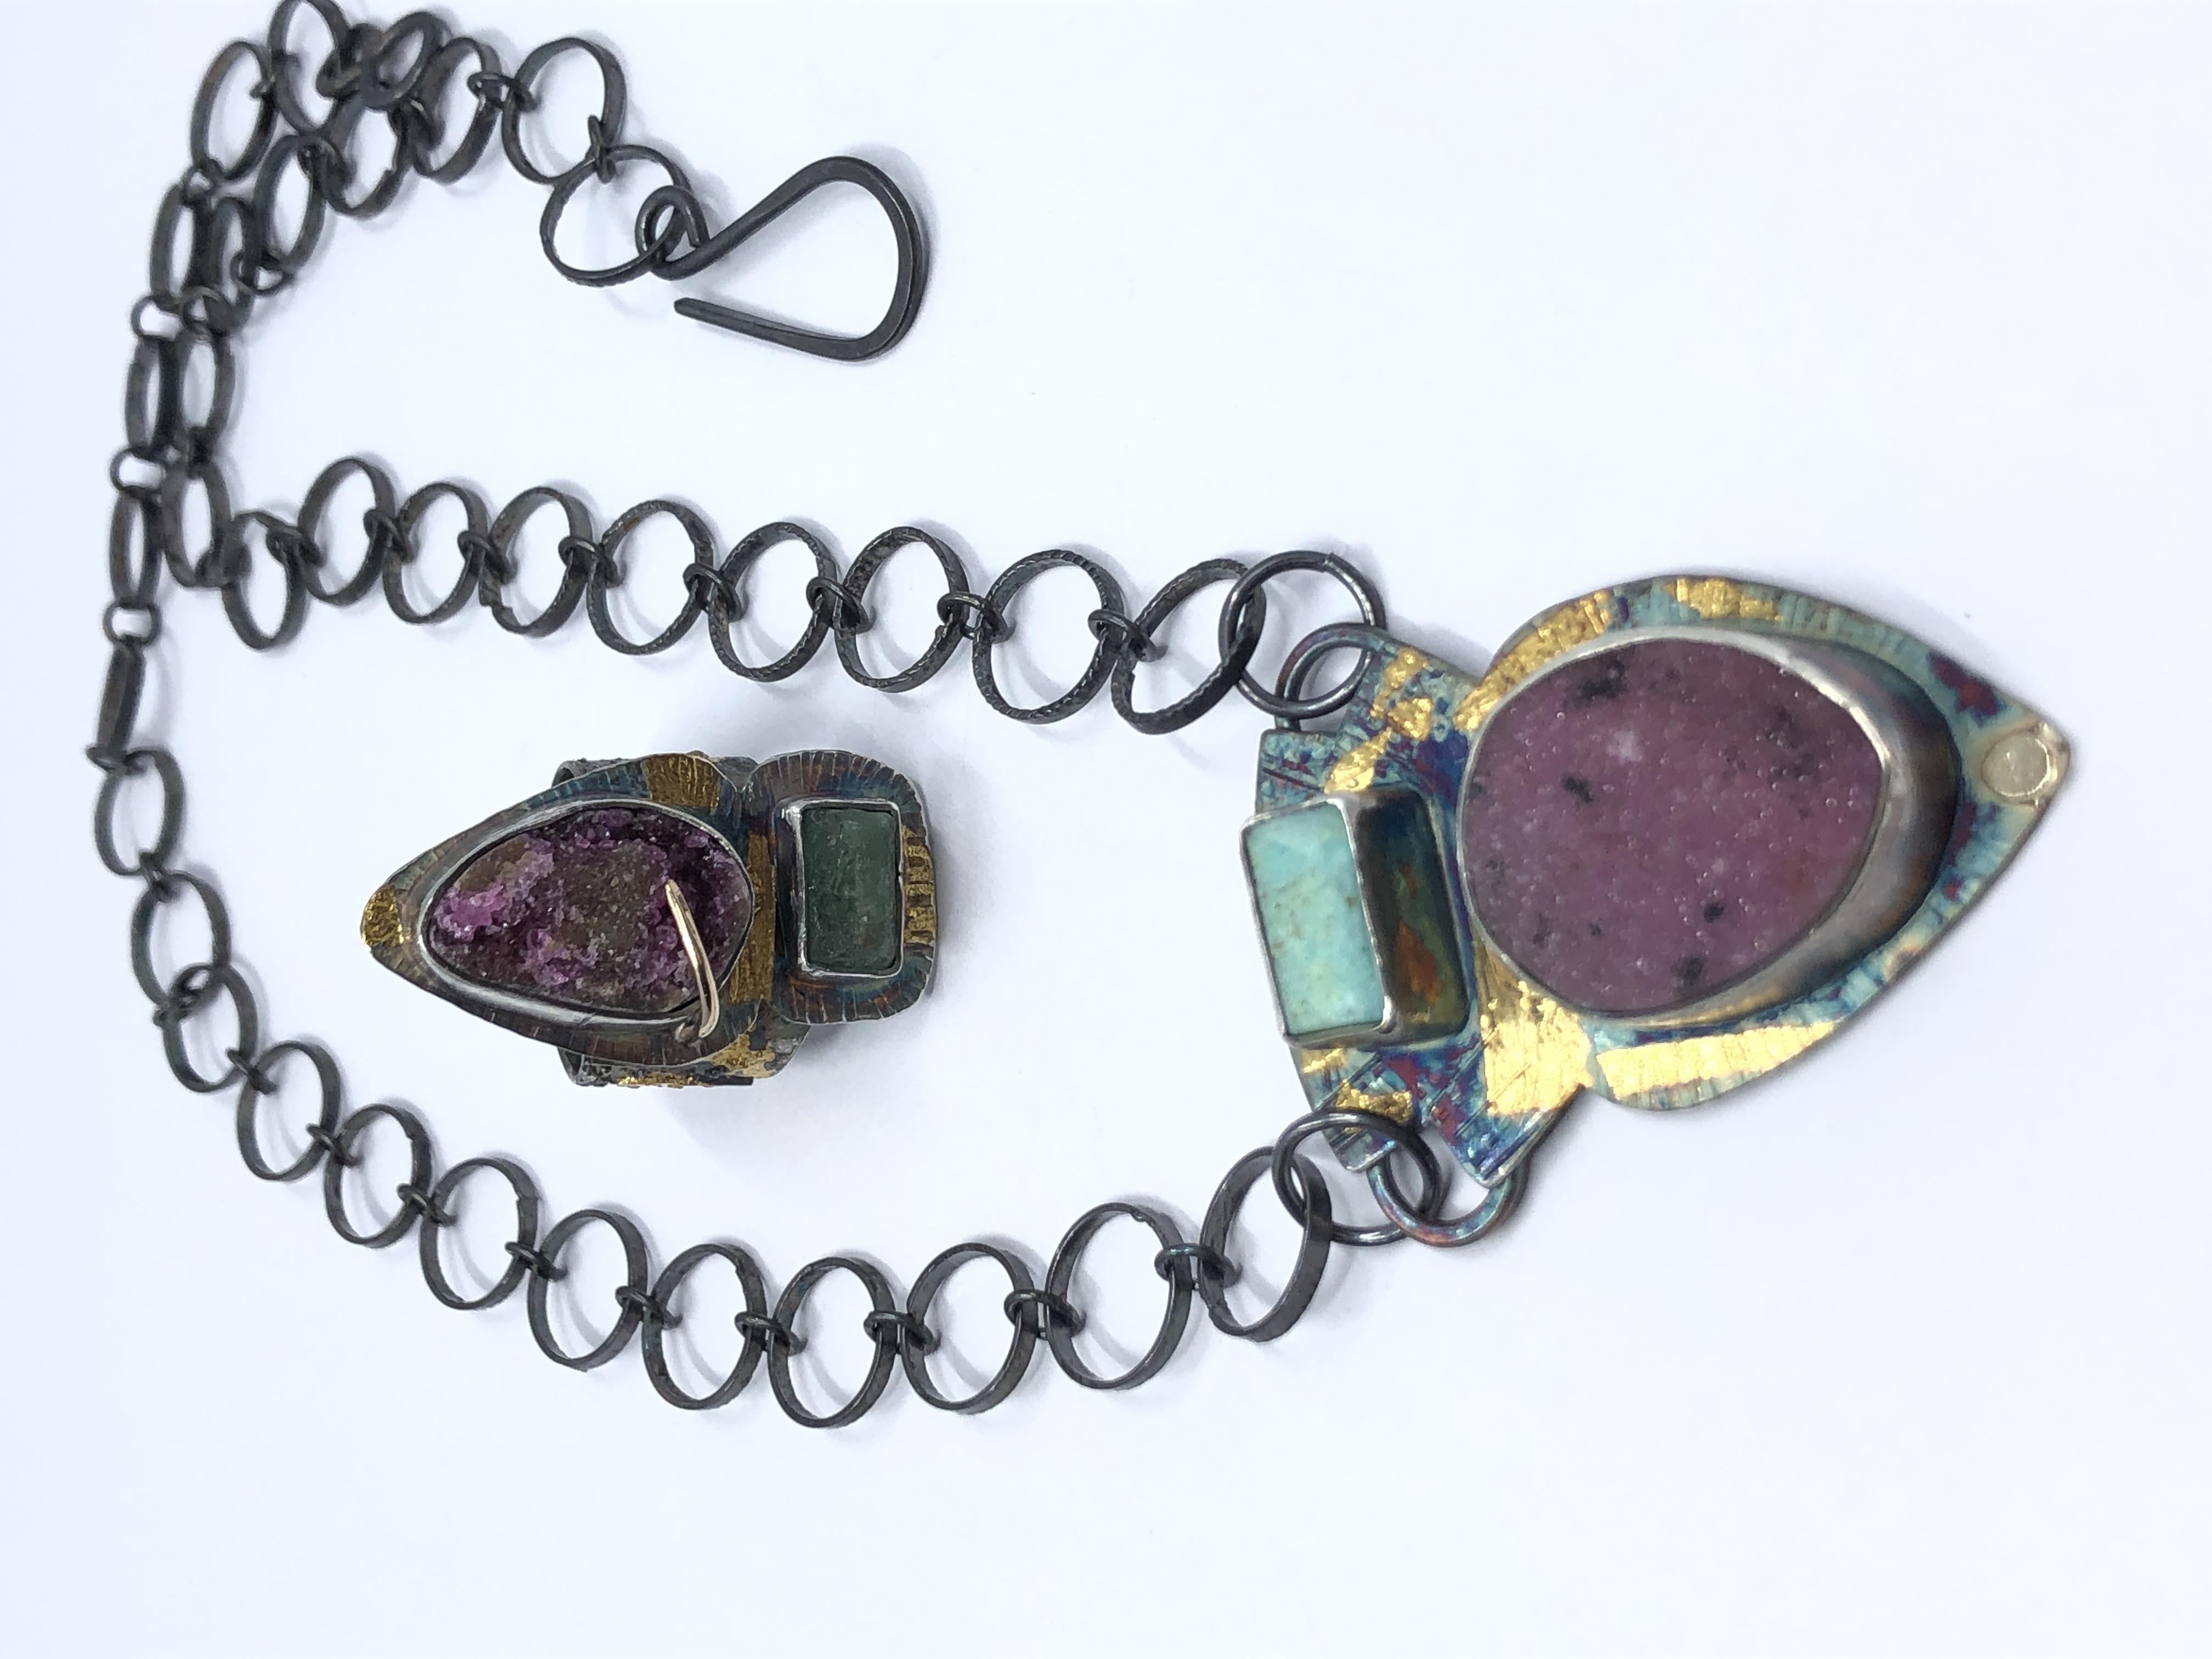 Colbalto and turquoise Neckpiece